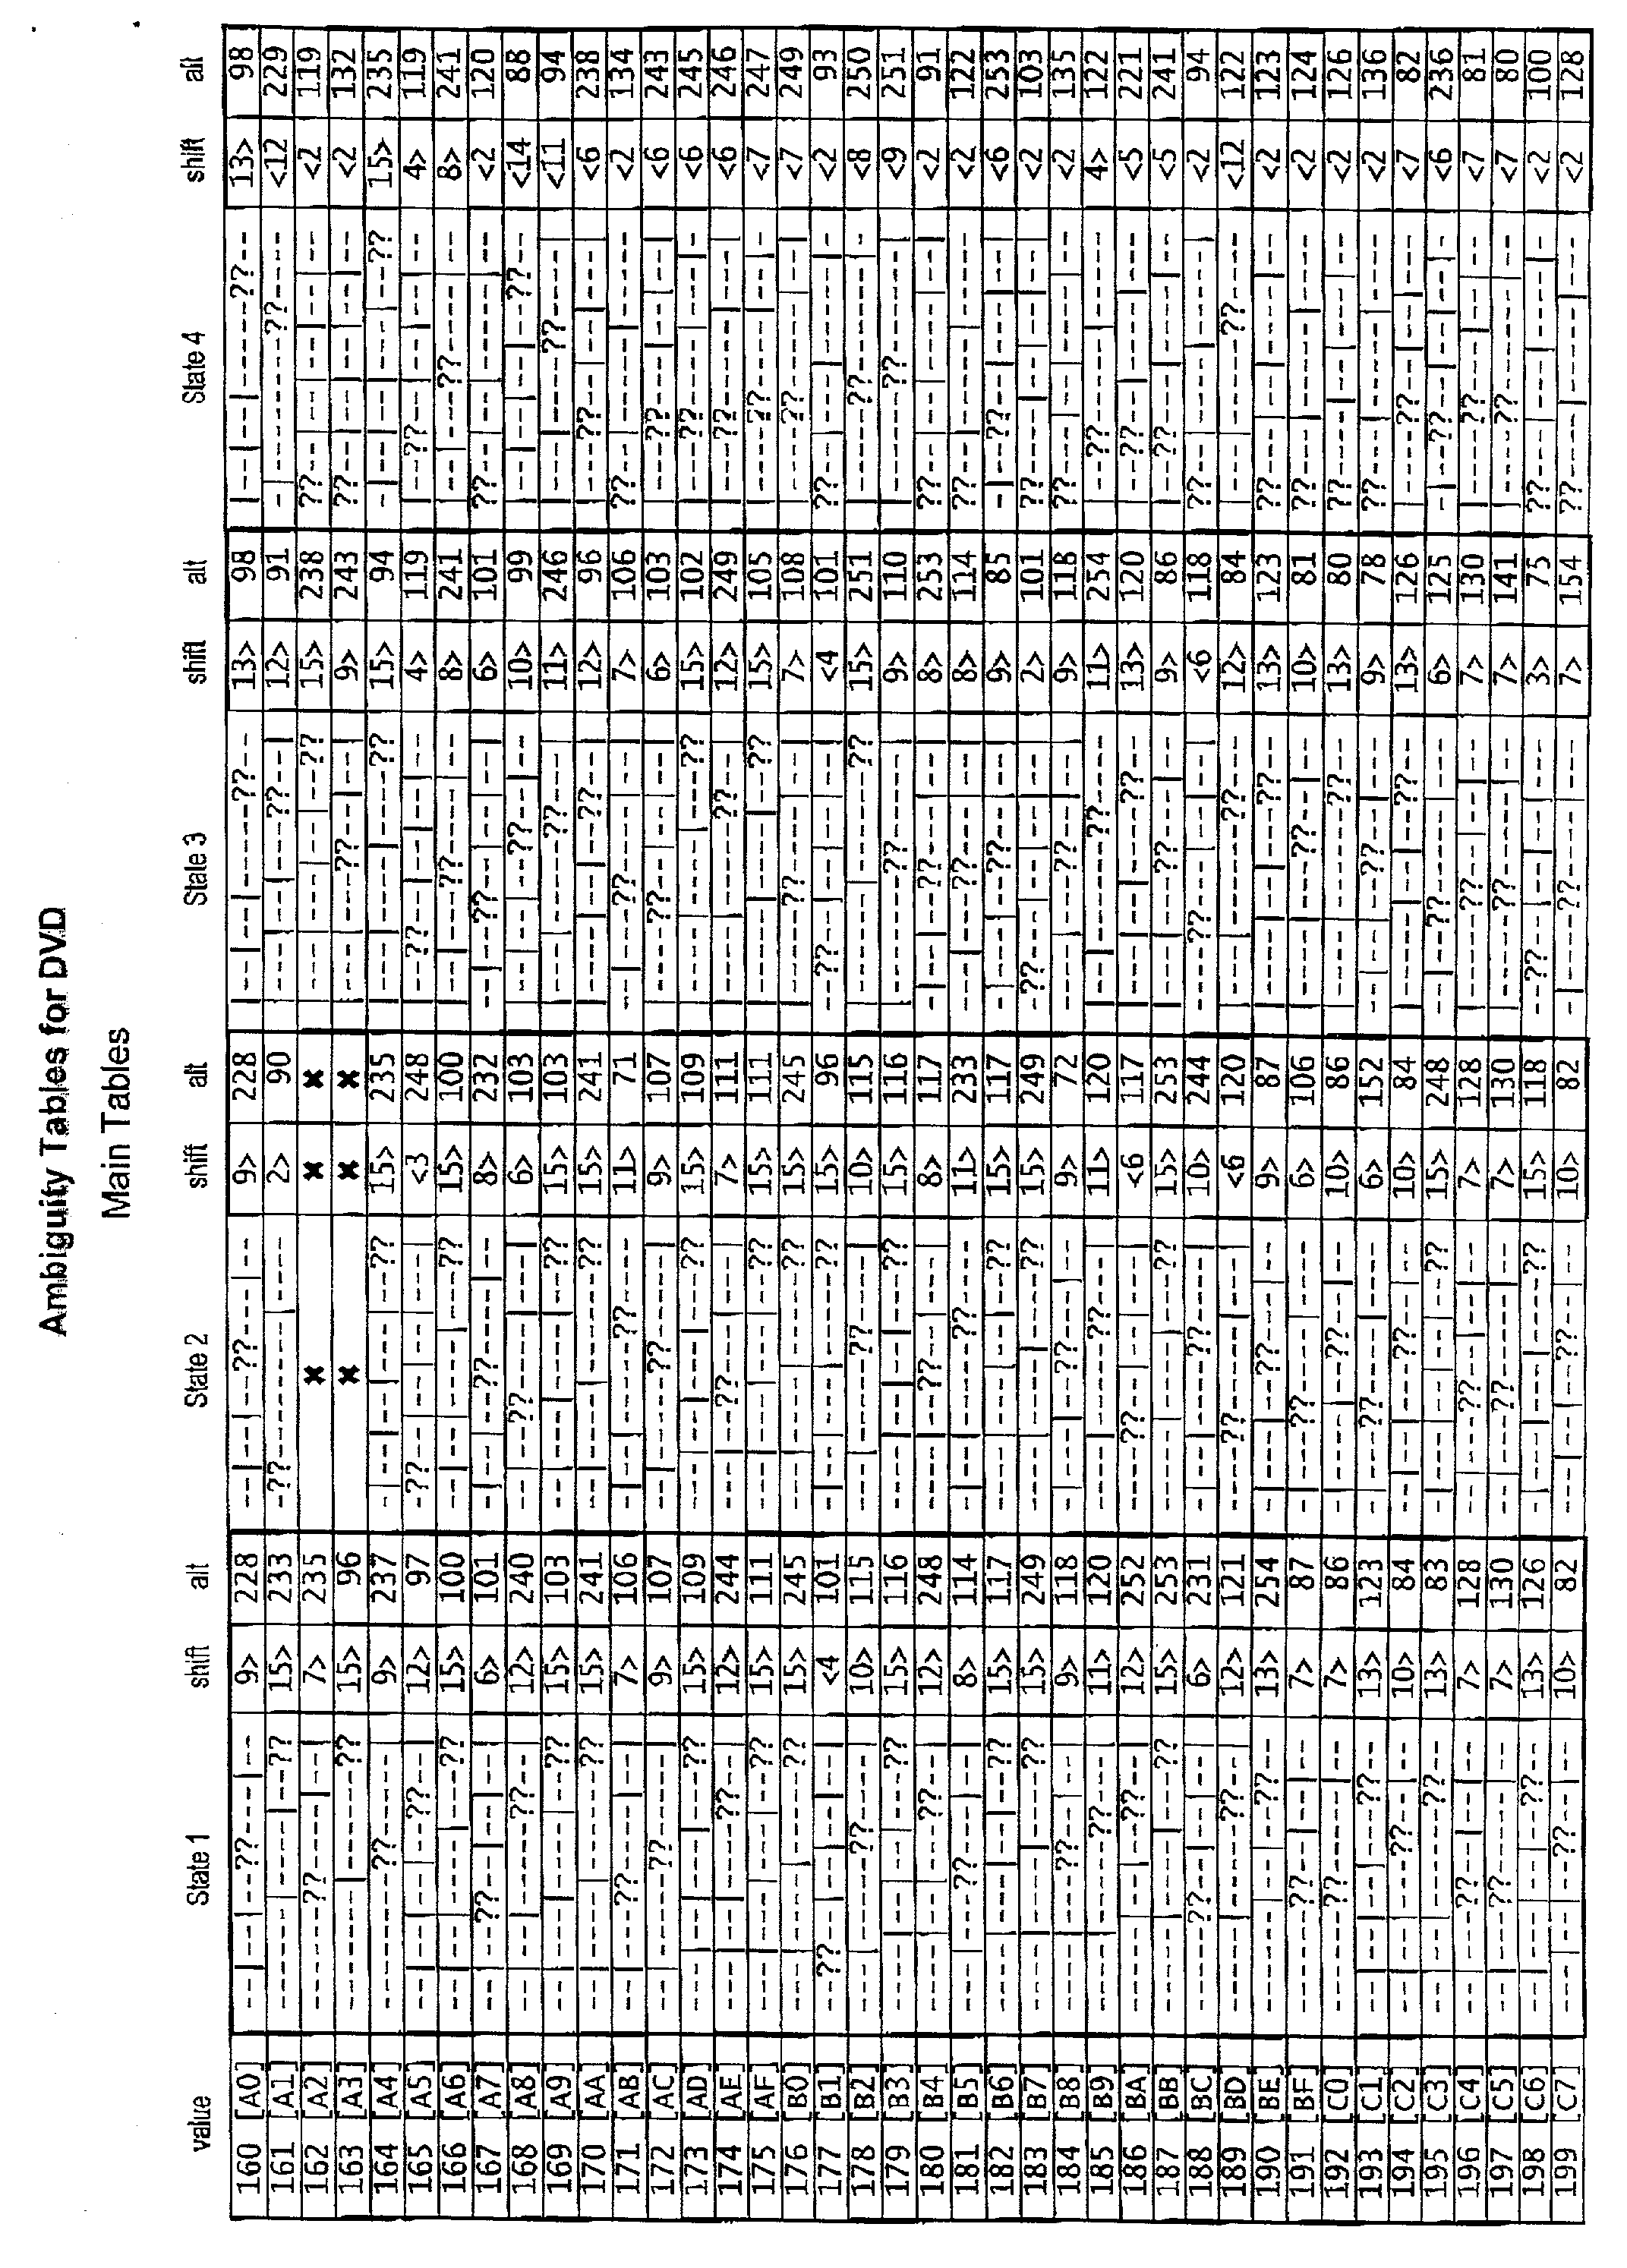 Figure US20020069389A1-20020606-P00006